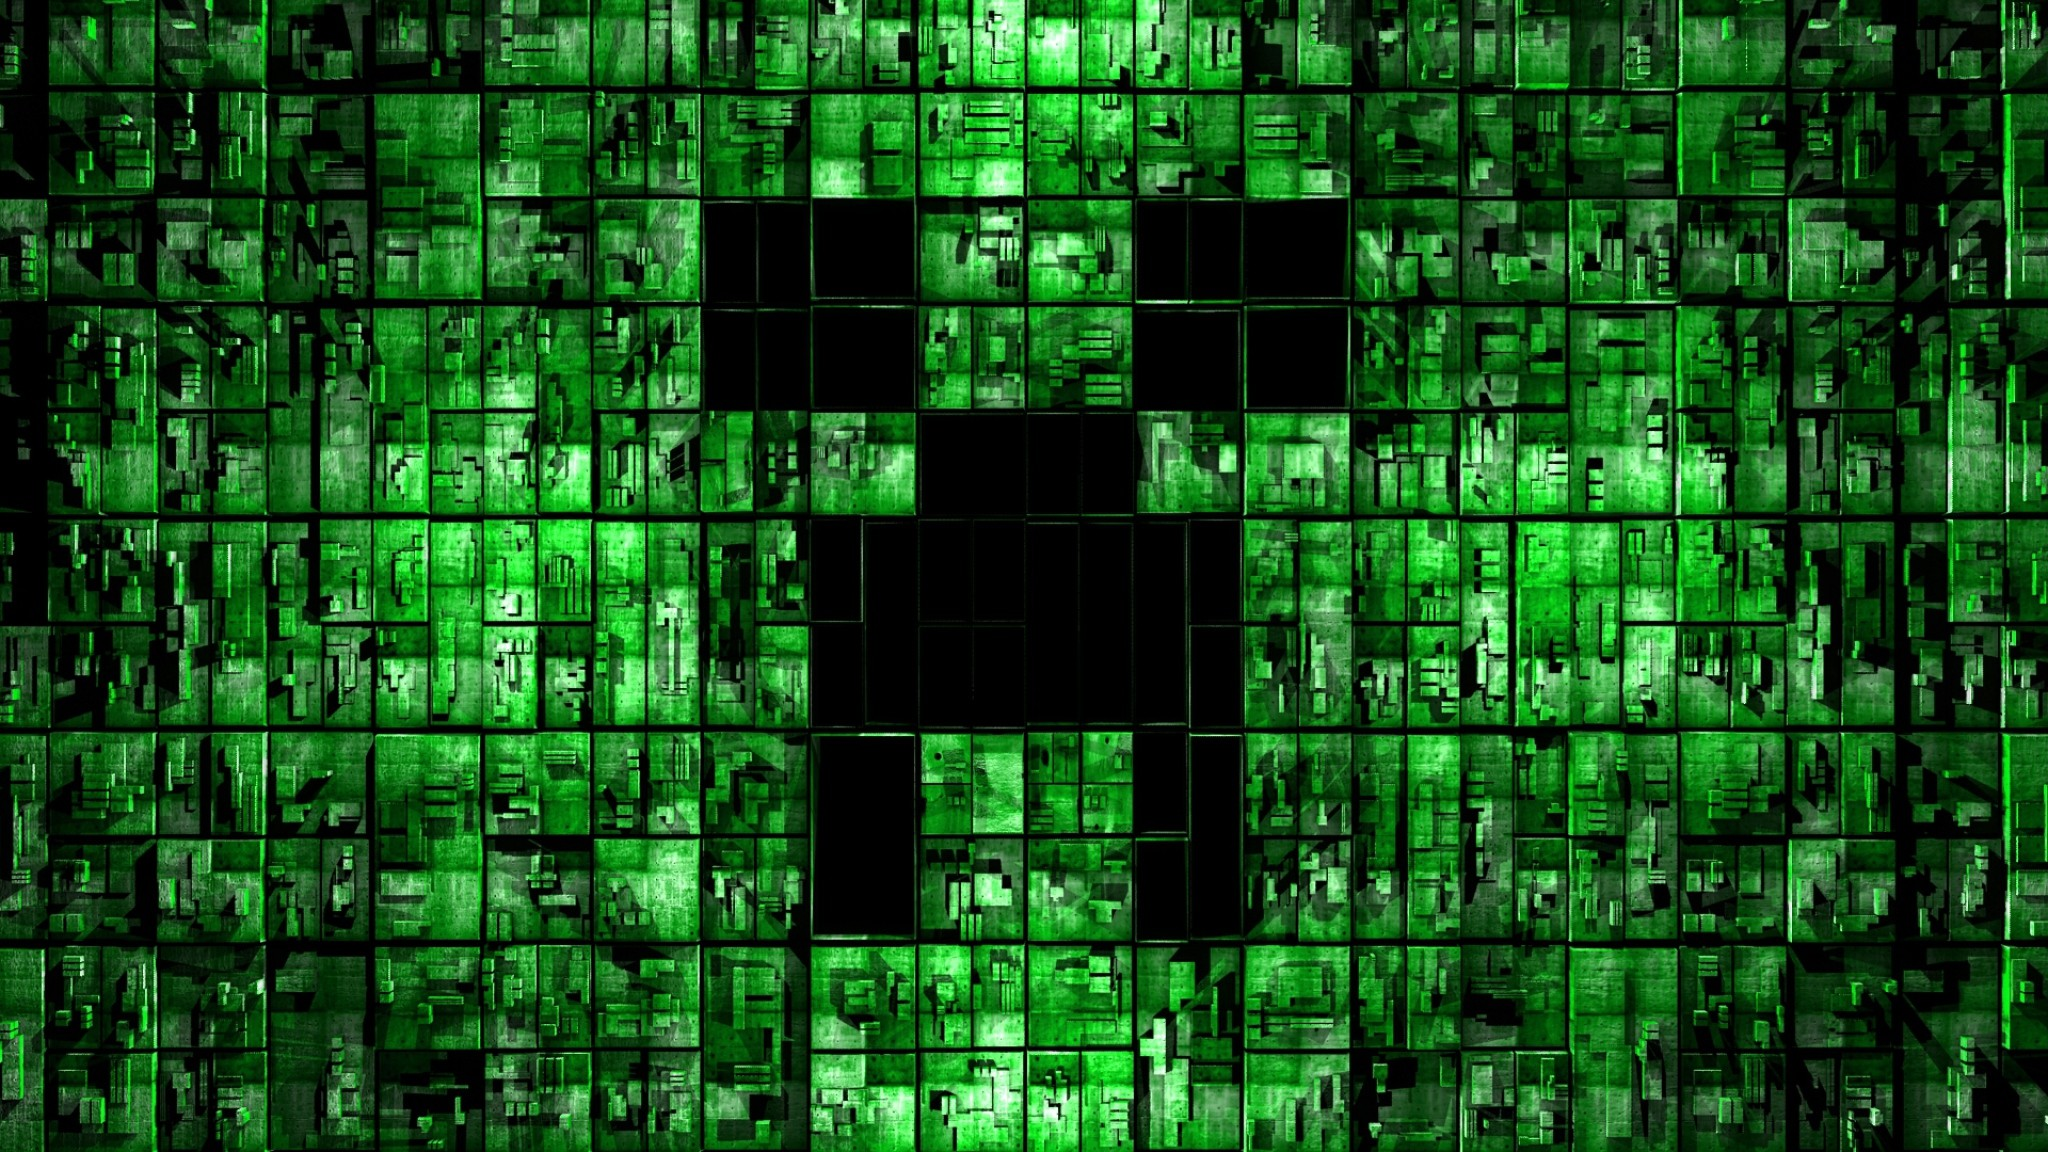 68 2048 By 1152 Pixels